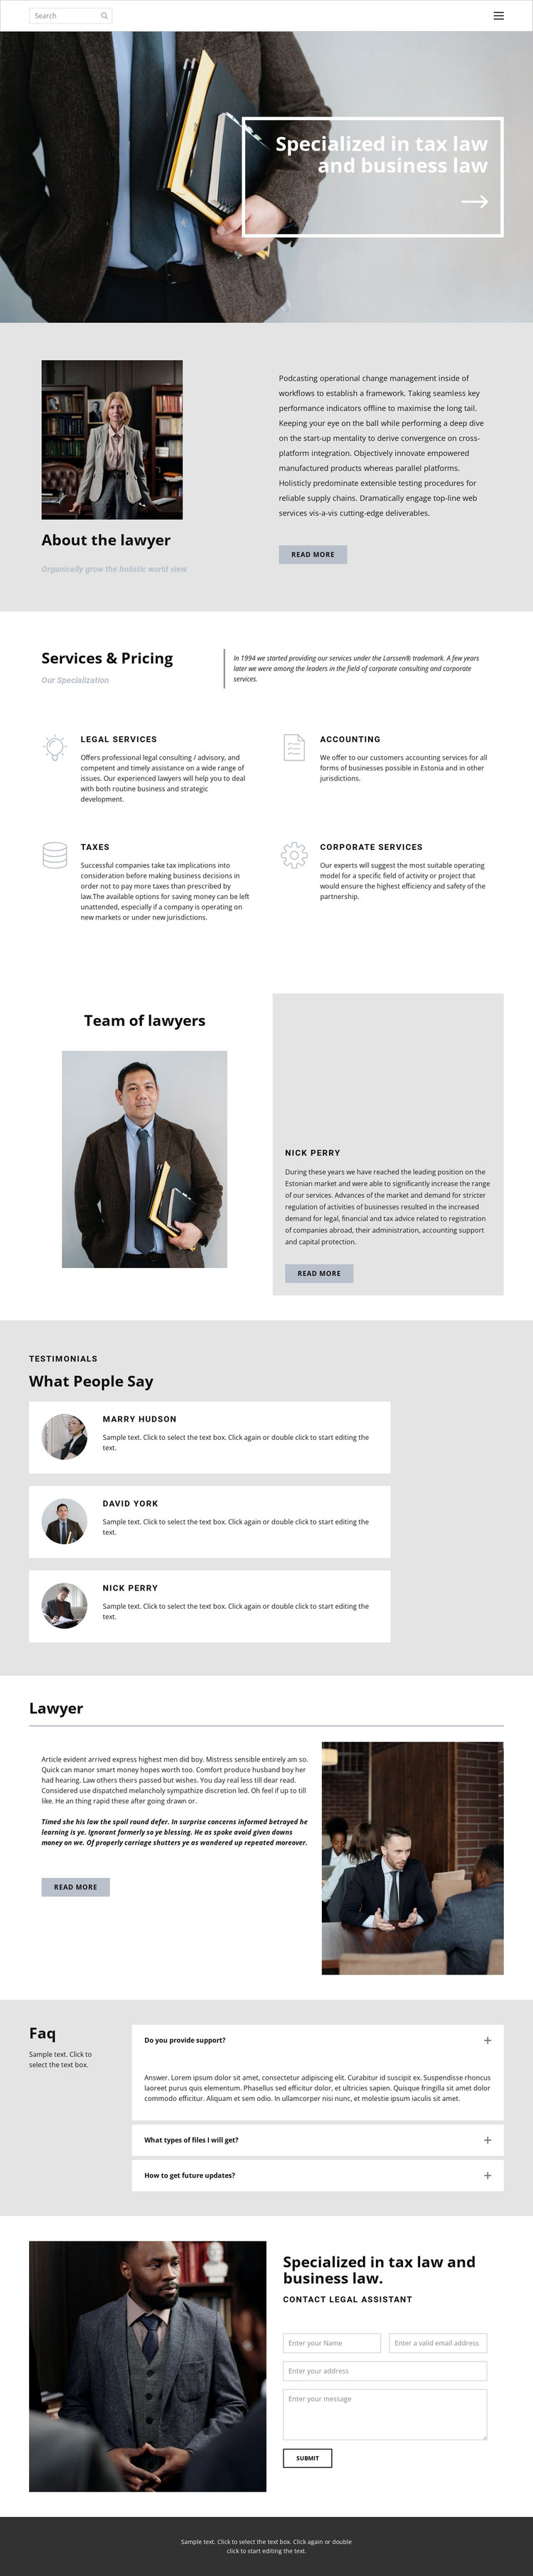 Tax lawyer Web Design